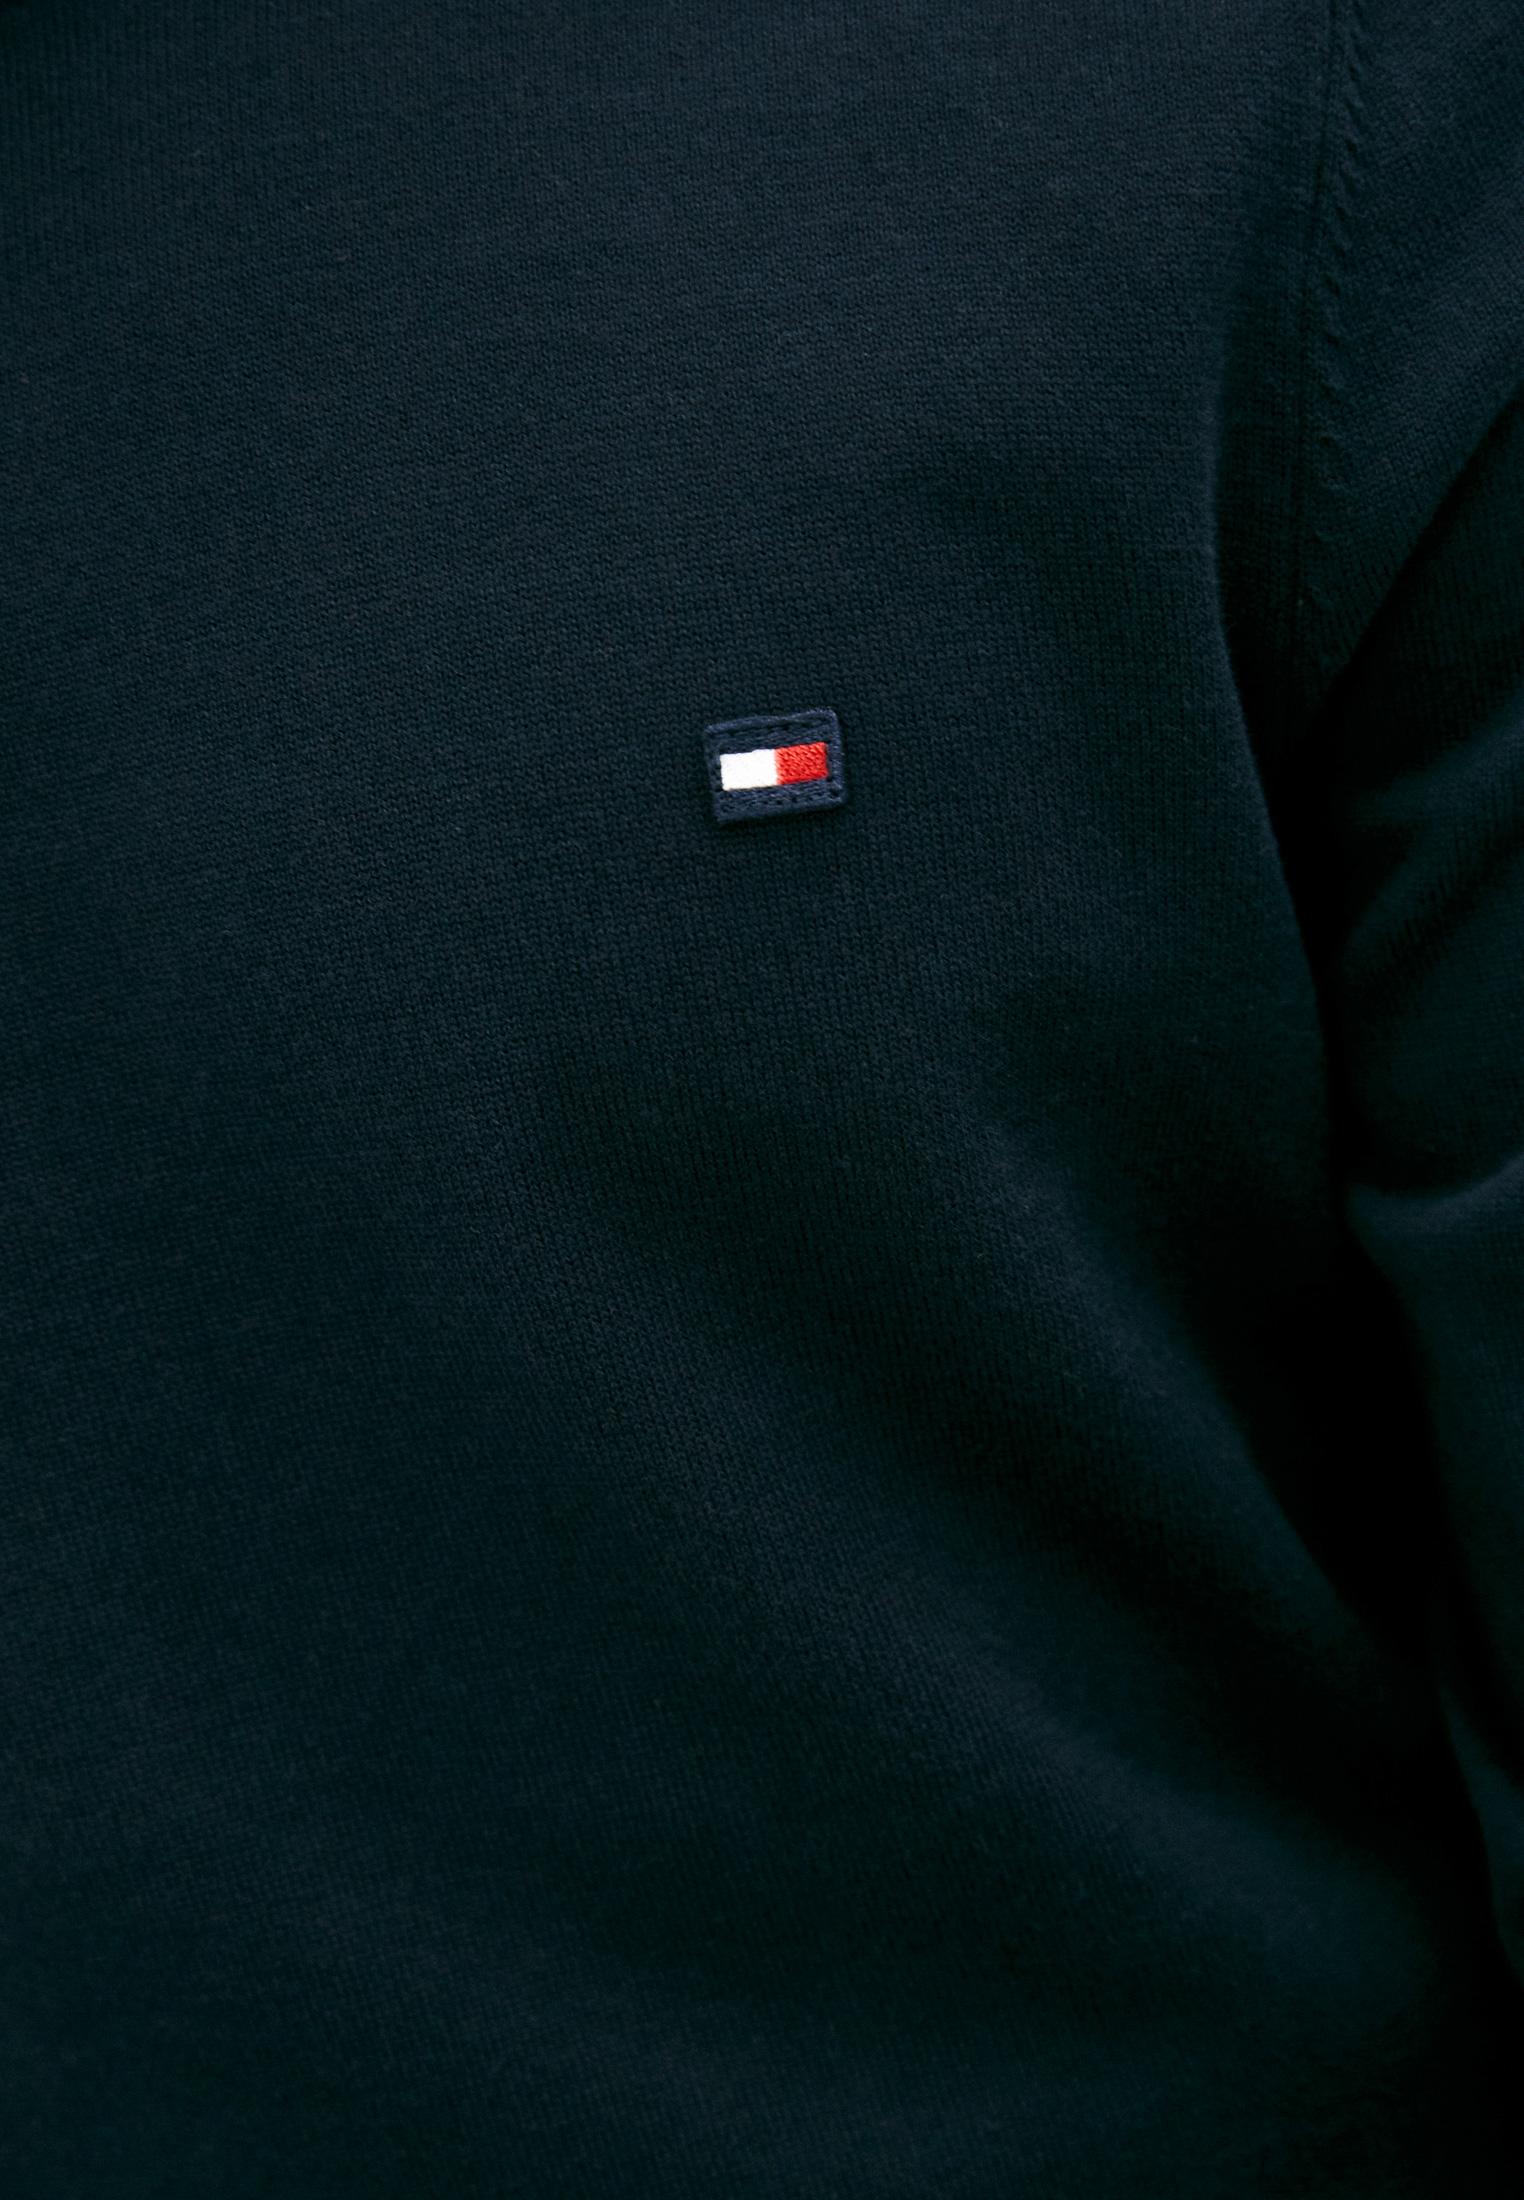 Джемпер Tommy Hilfiger (Томми Хилфигер) MW0MW17358: изображение 4